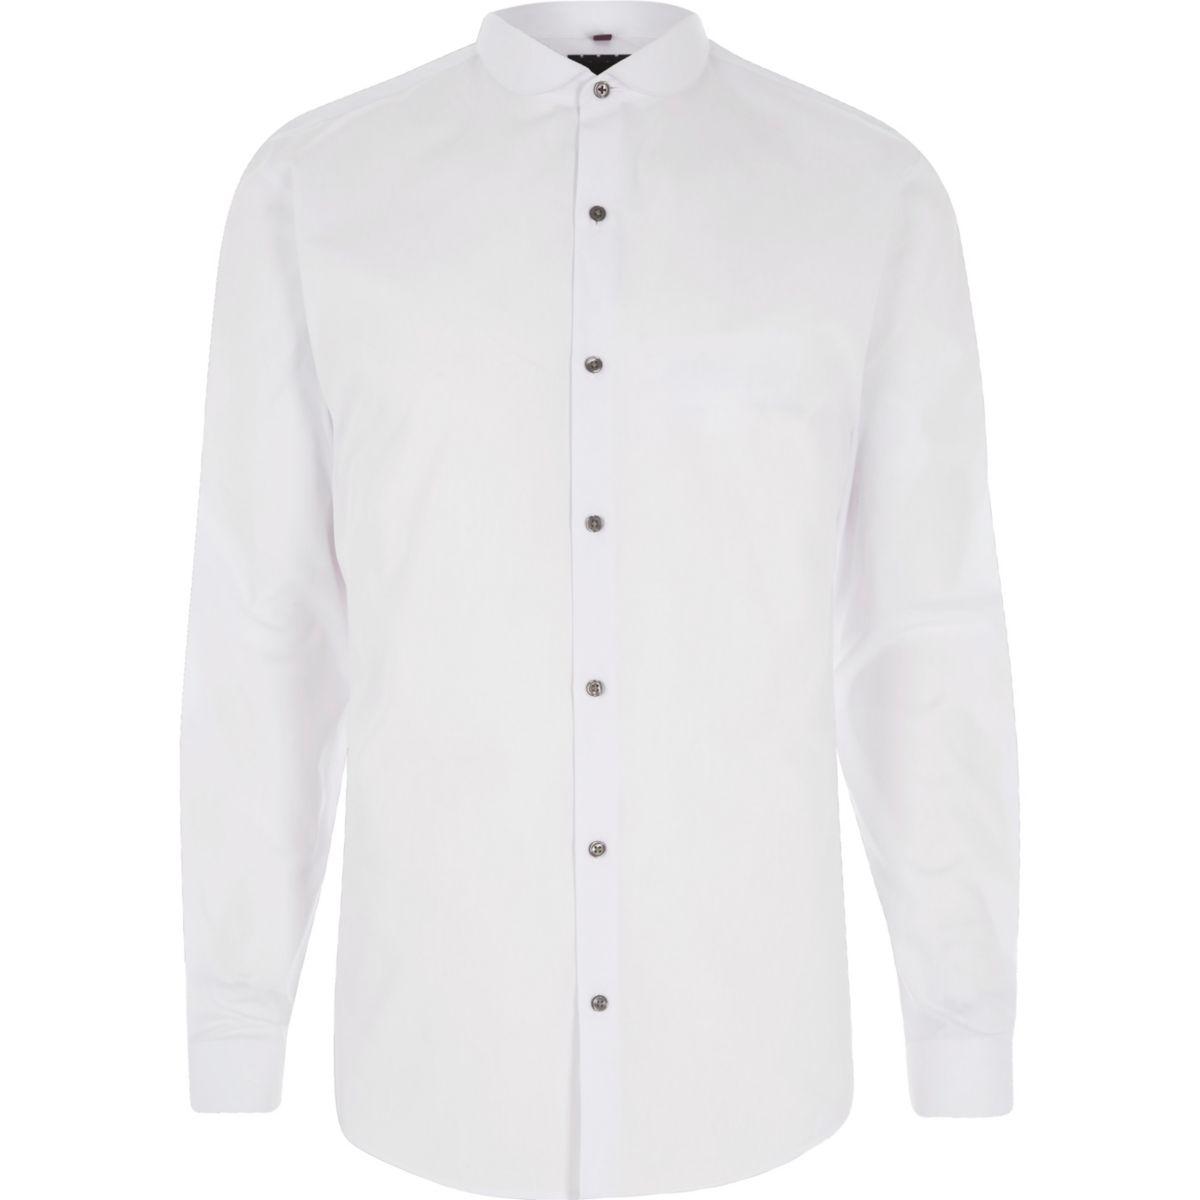 White penny collar long sleeve slim fit shirt